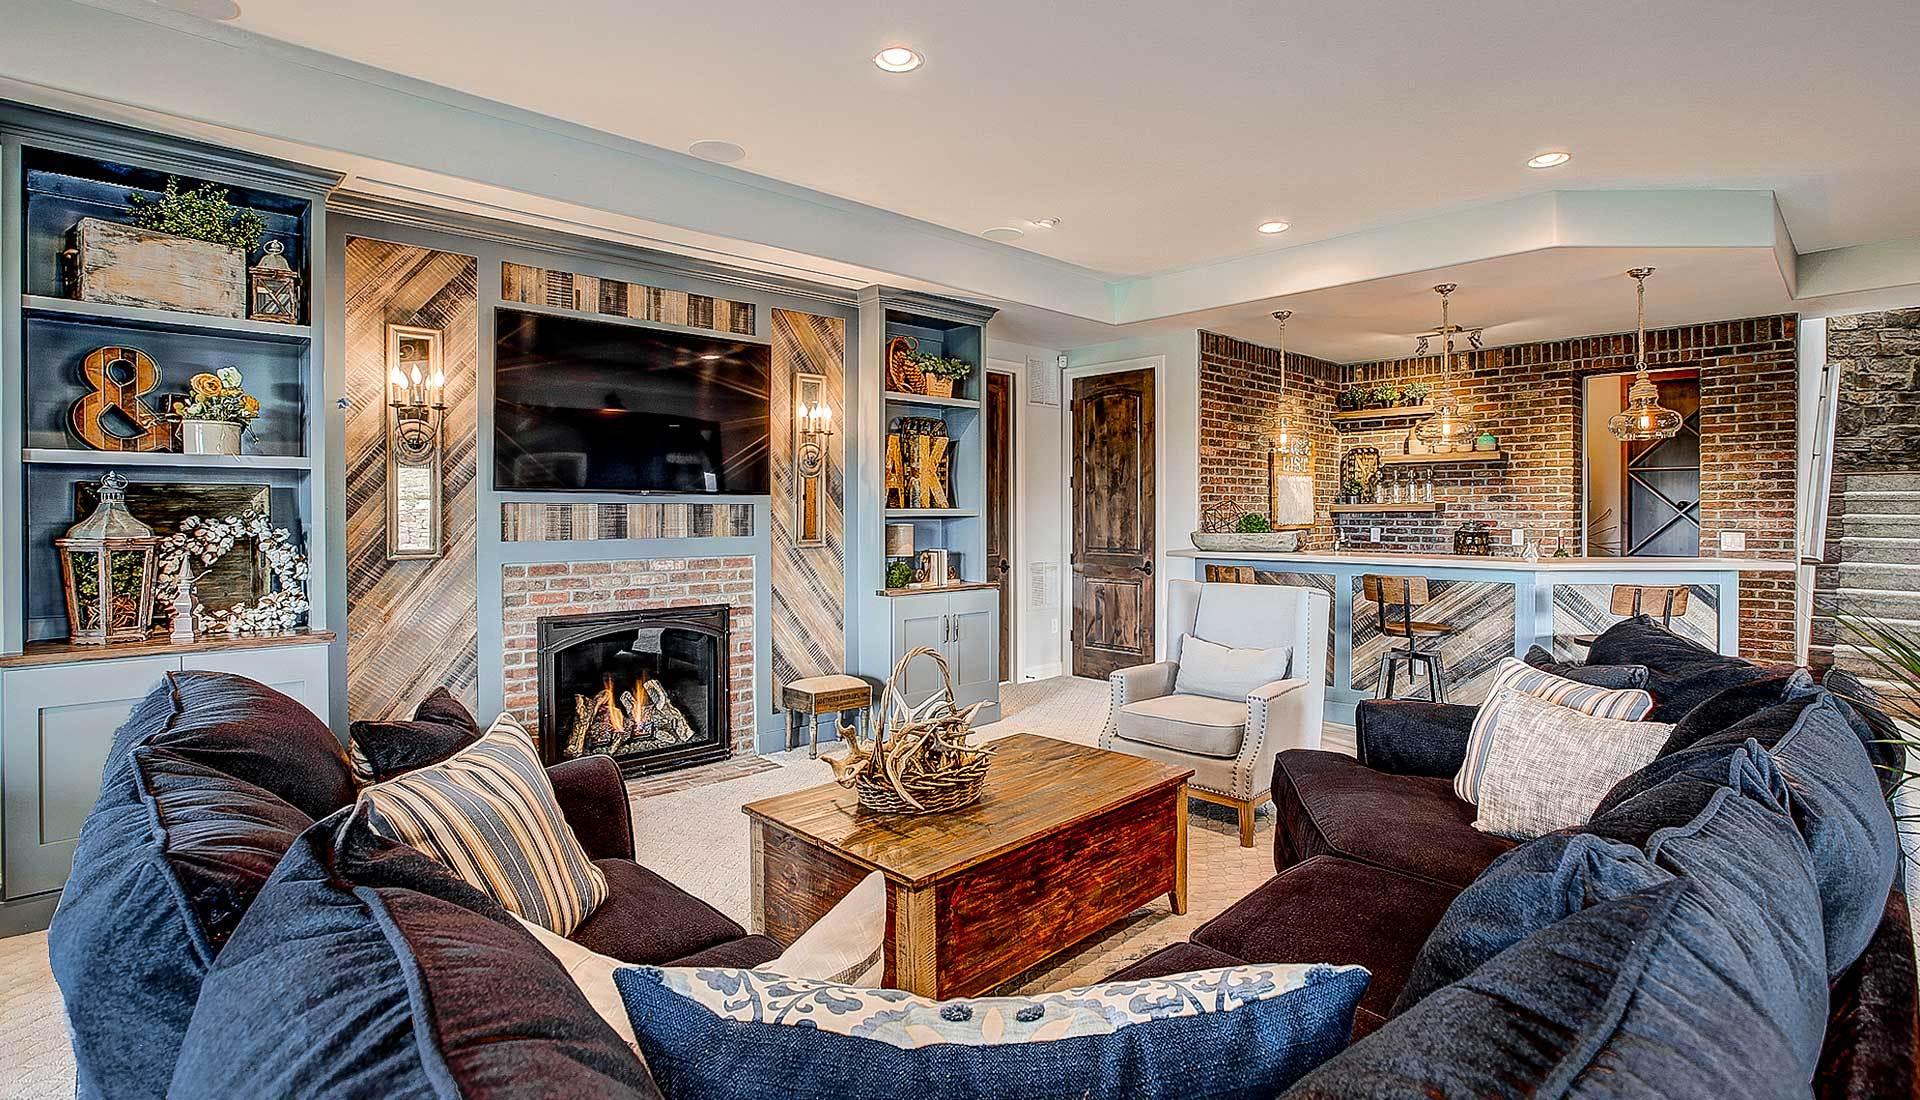 'Galiant' by Galiant Homes in Colorado Springs